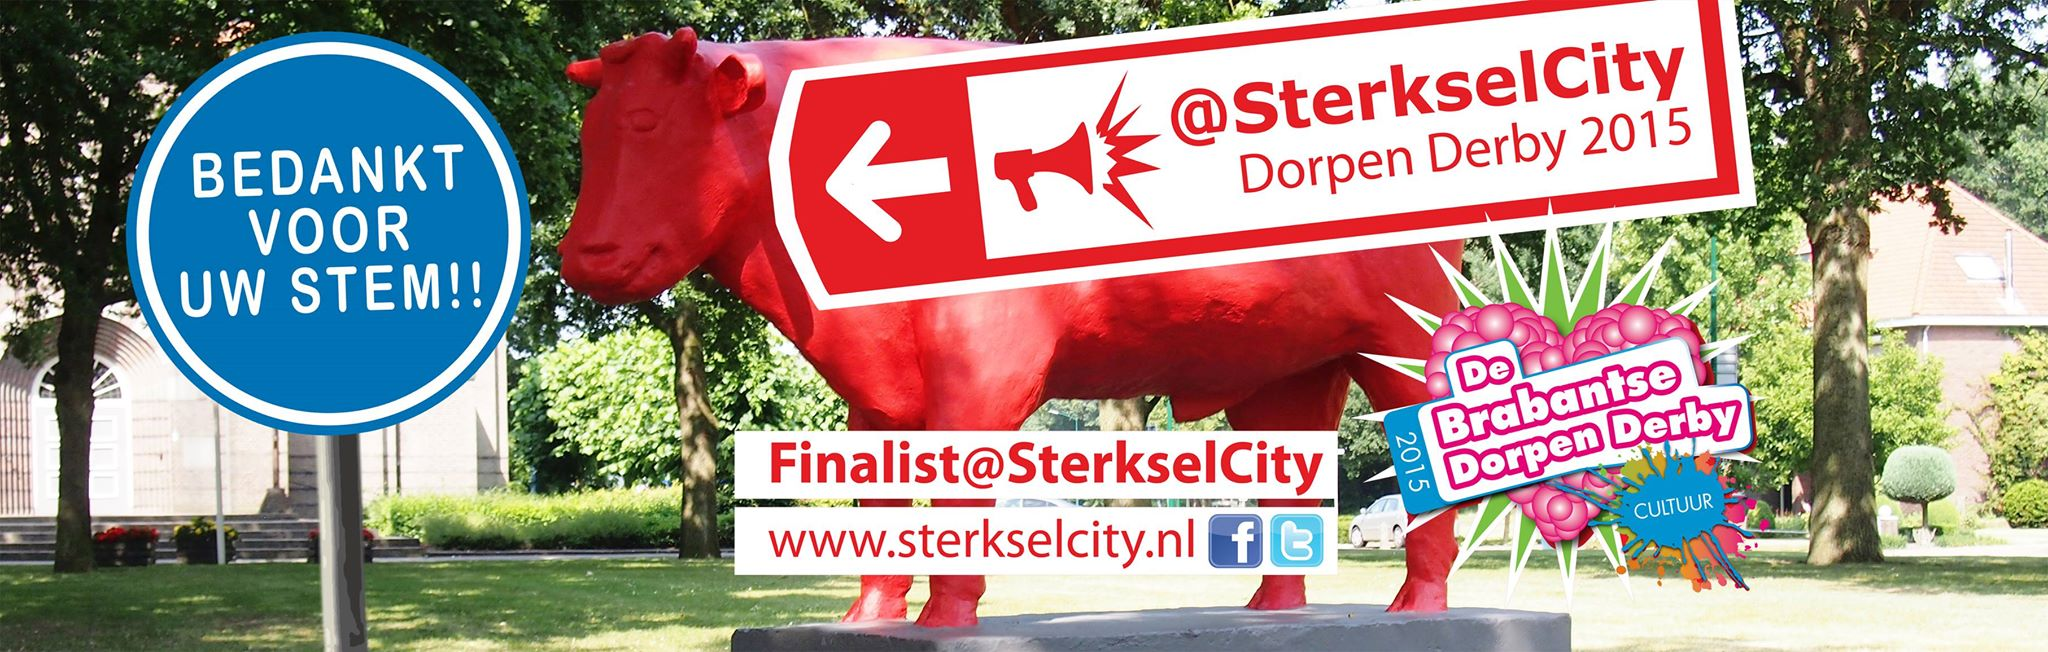 @SterkselCity Logo